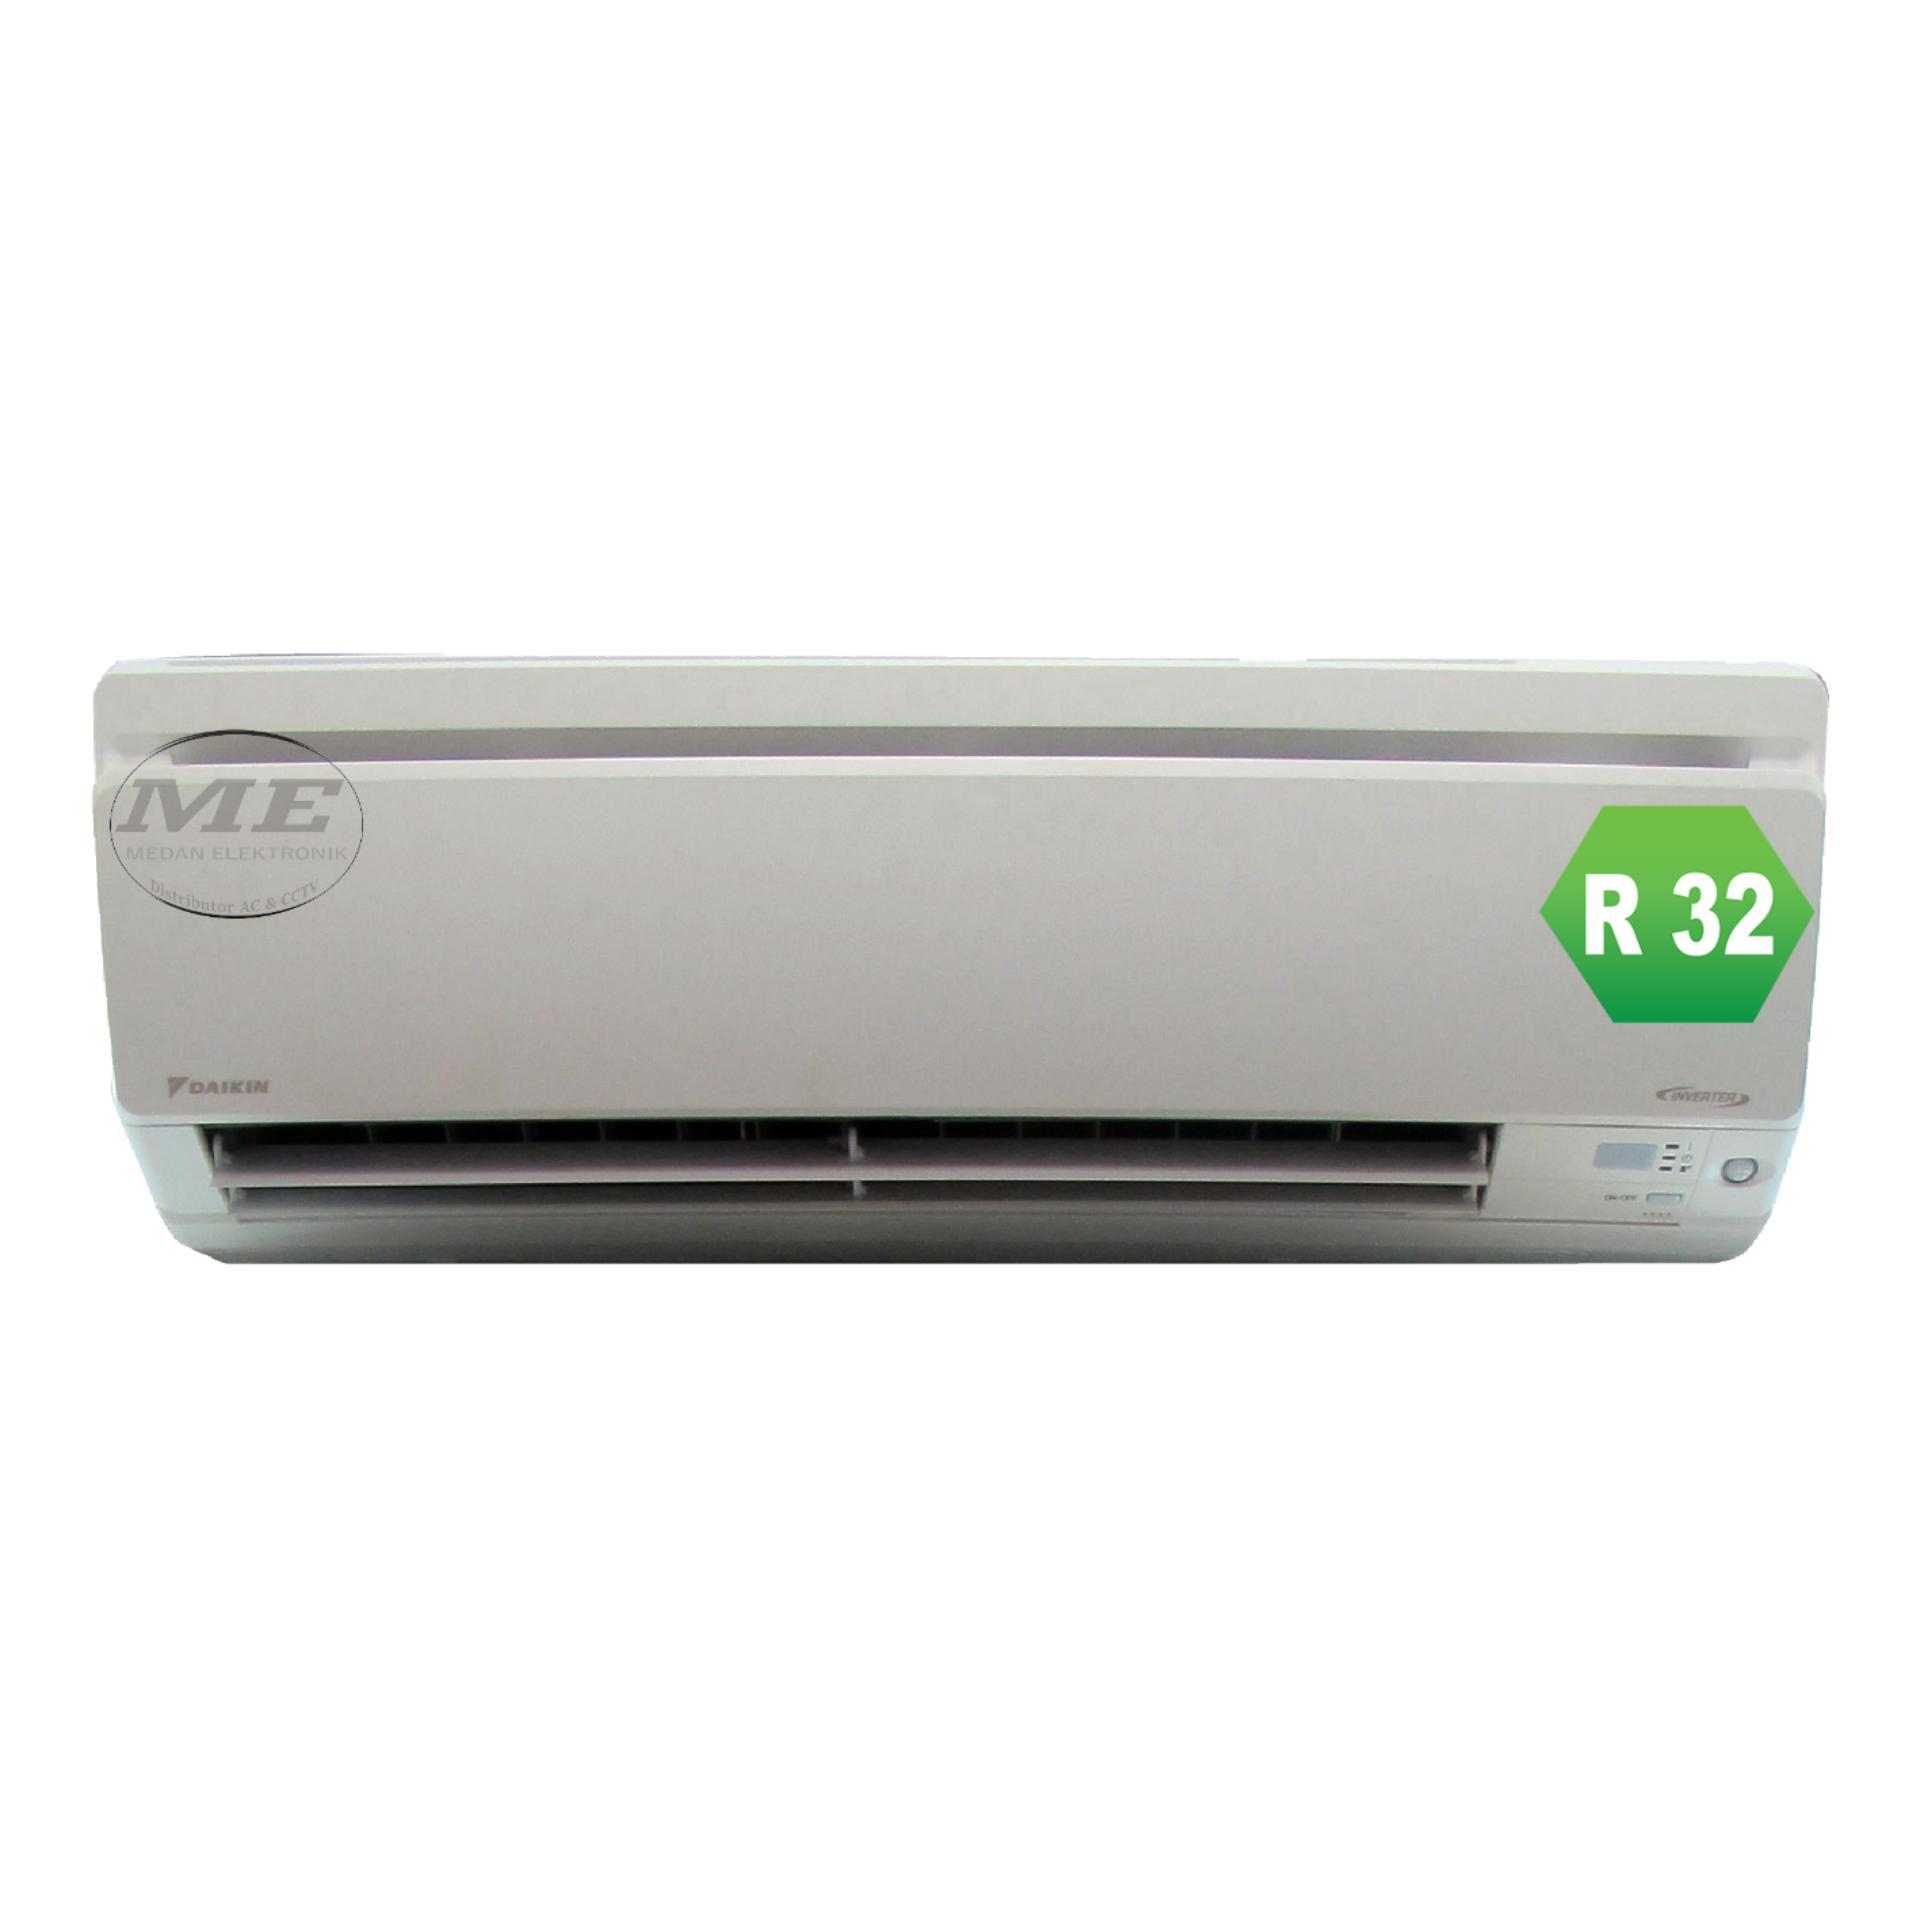 AC Daikin STKV 60 NV Inverter 2 1 PK